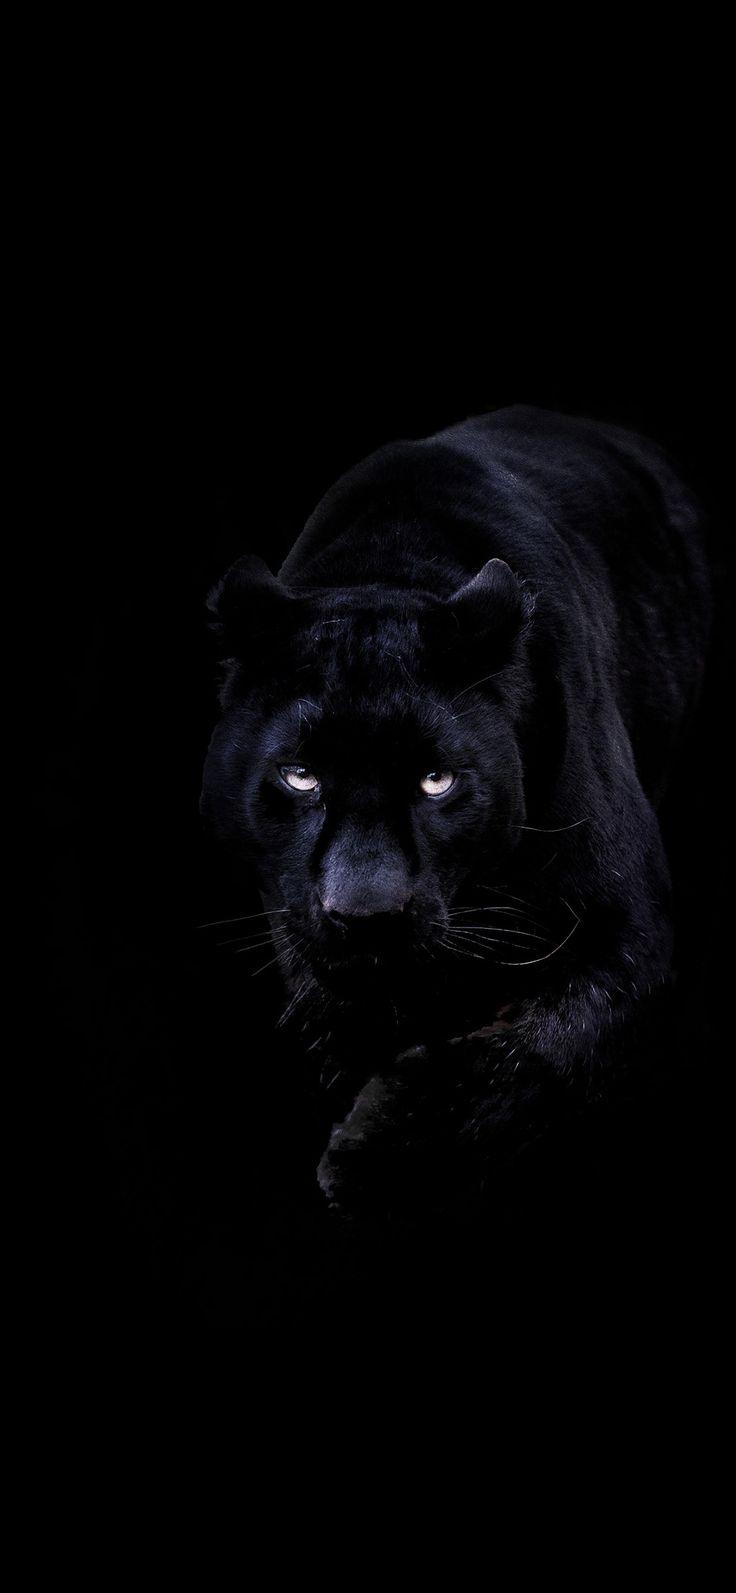 Iphone X Wallpaper Bd93 Animal Dark Black Pahter Art